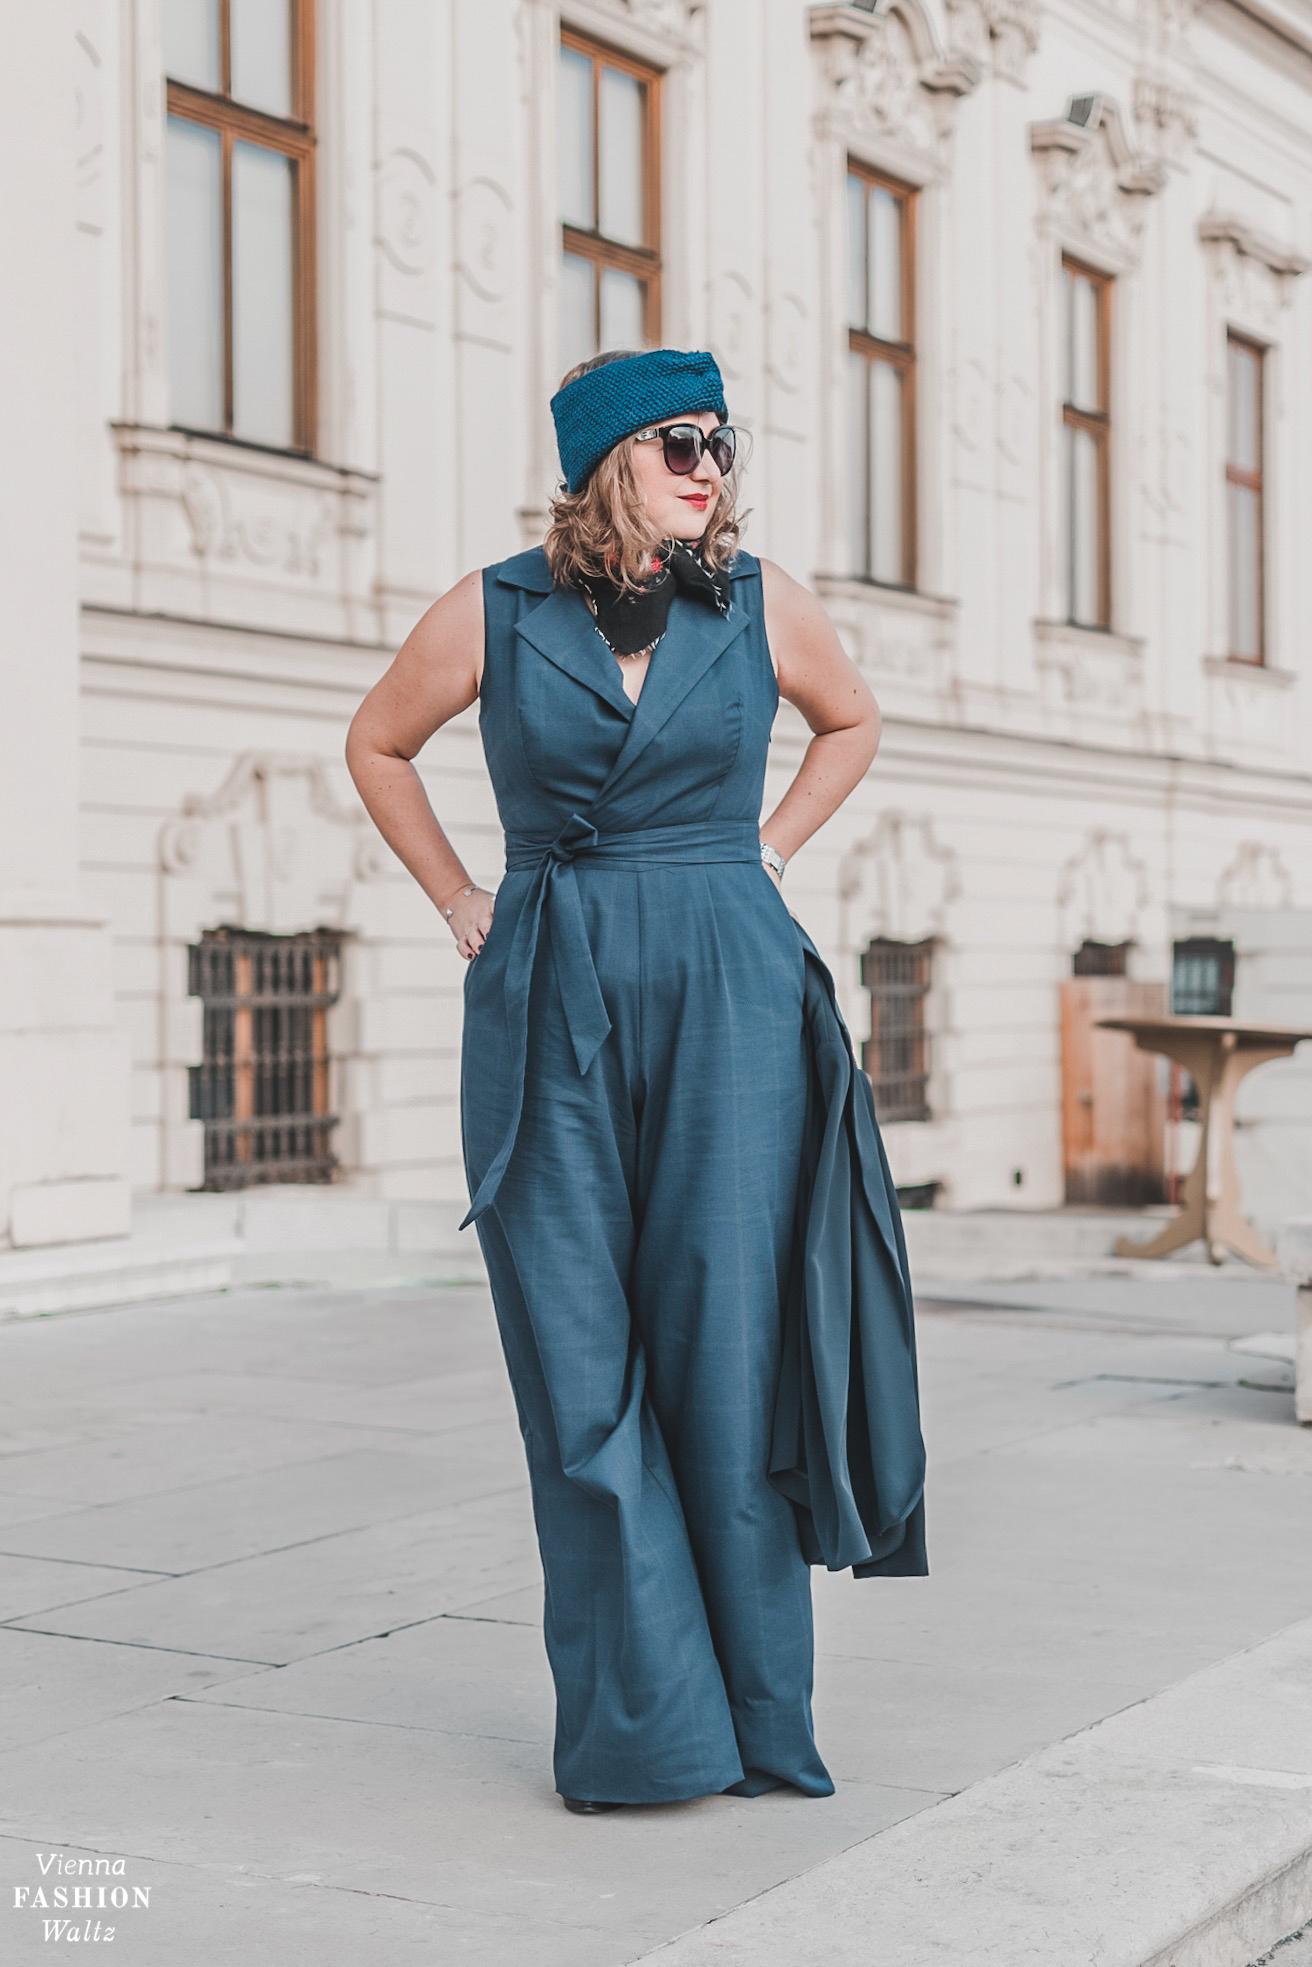 Karomuster stylen, trendige damenmode, slow fashion, Atelier Snow